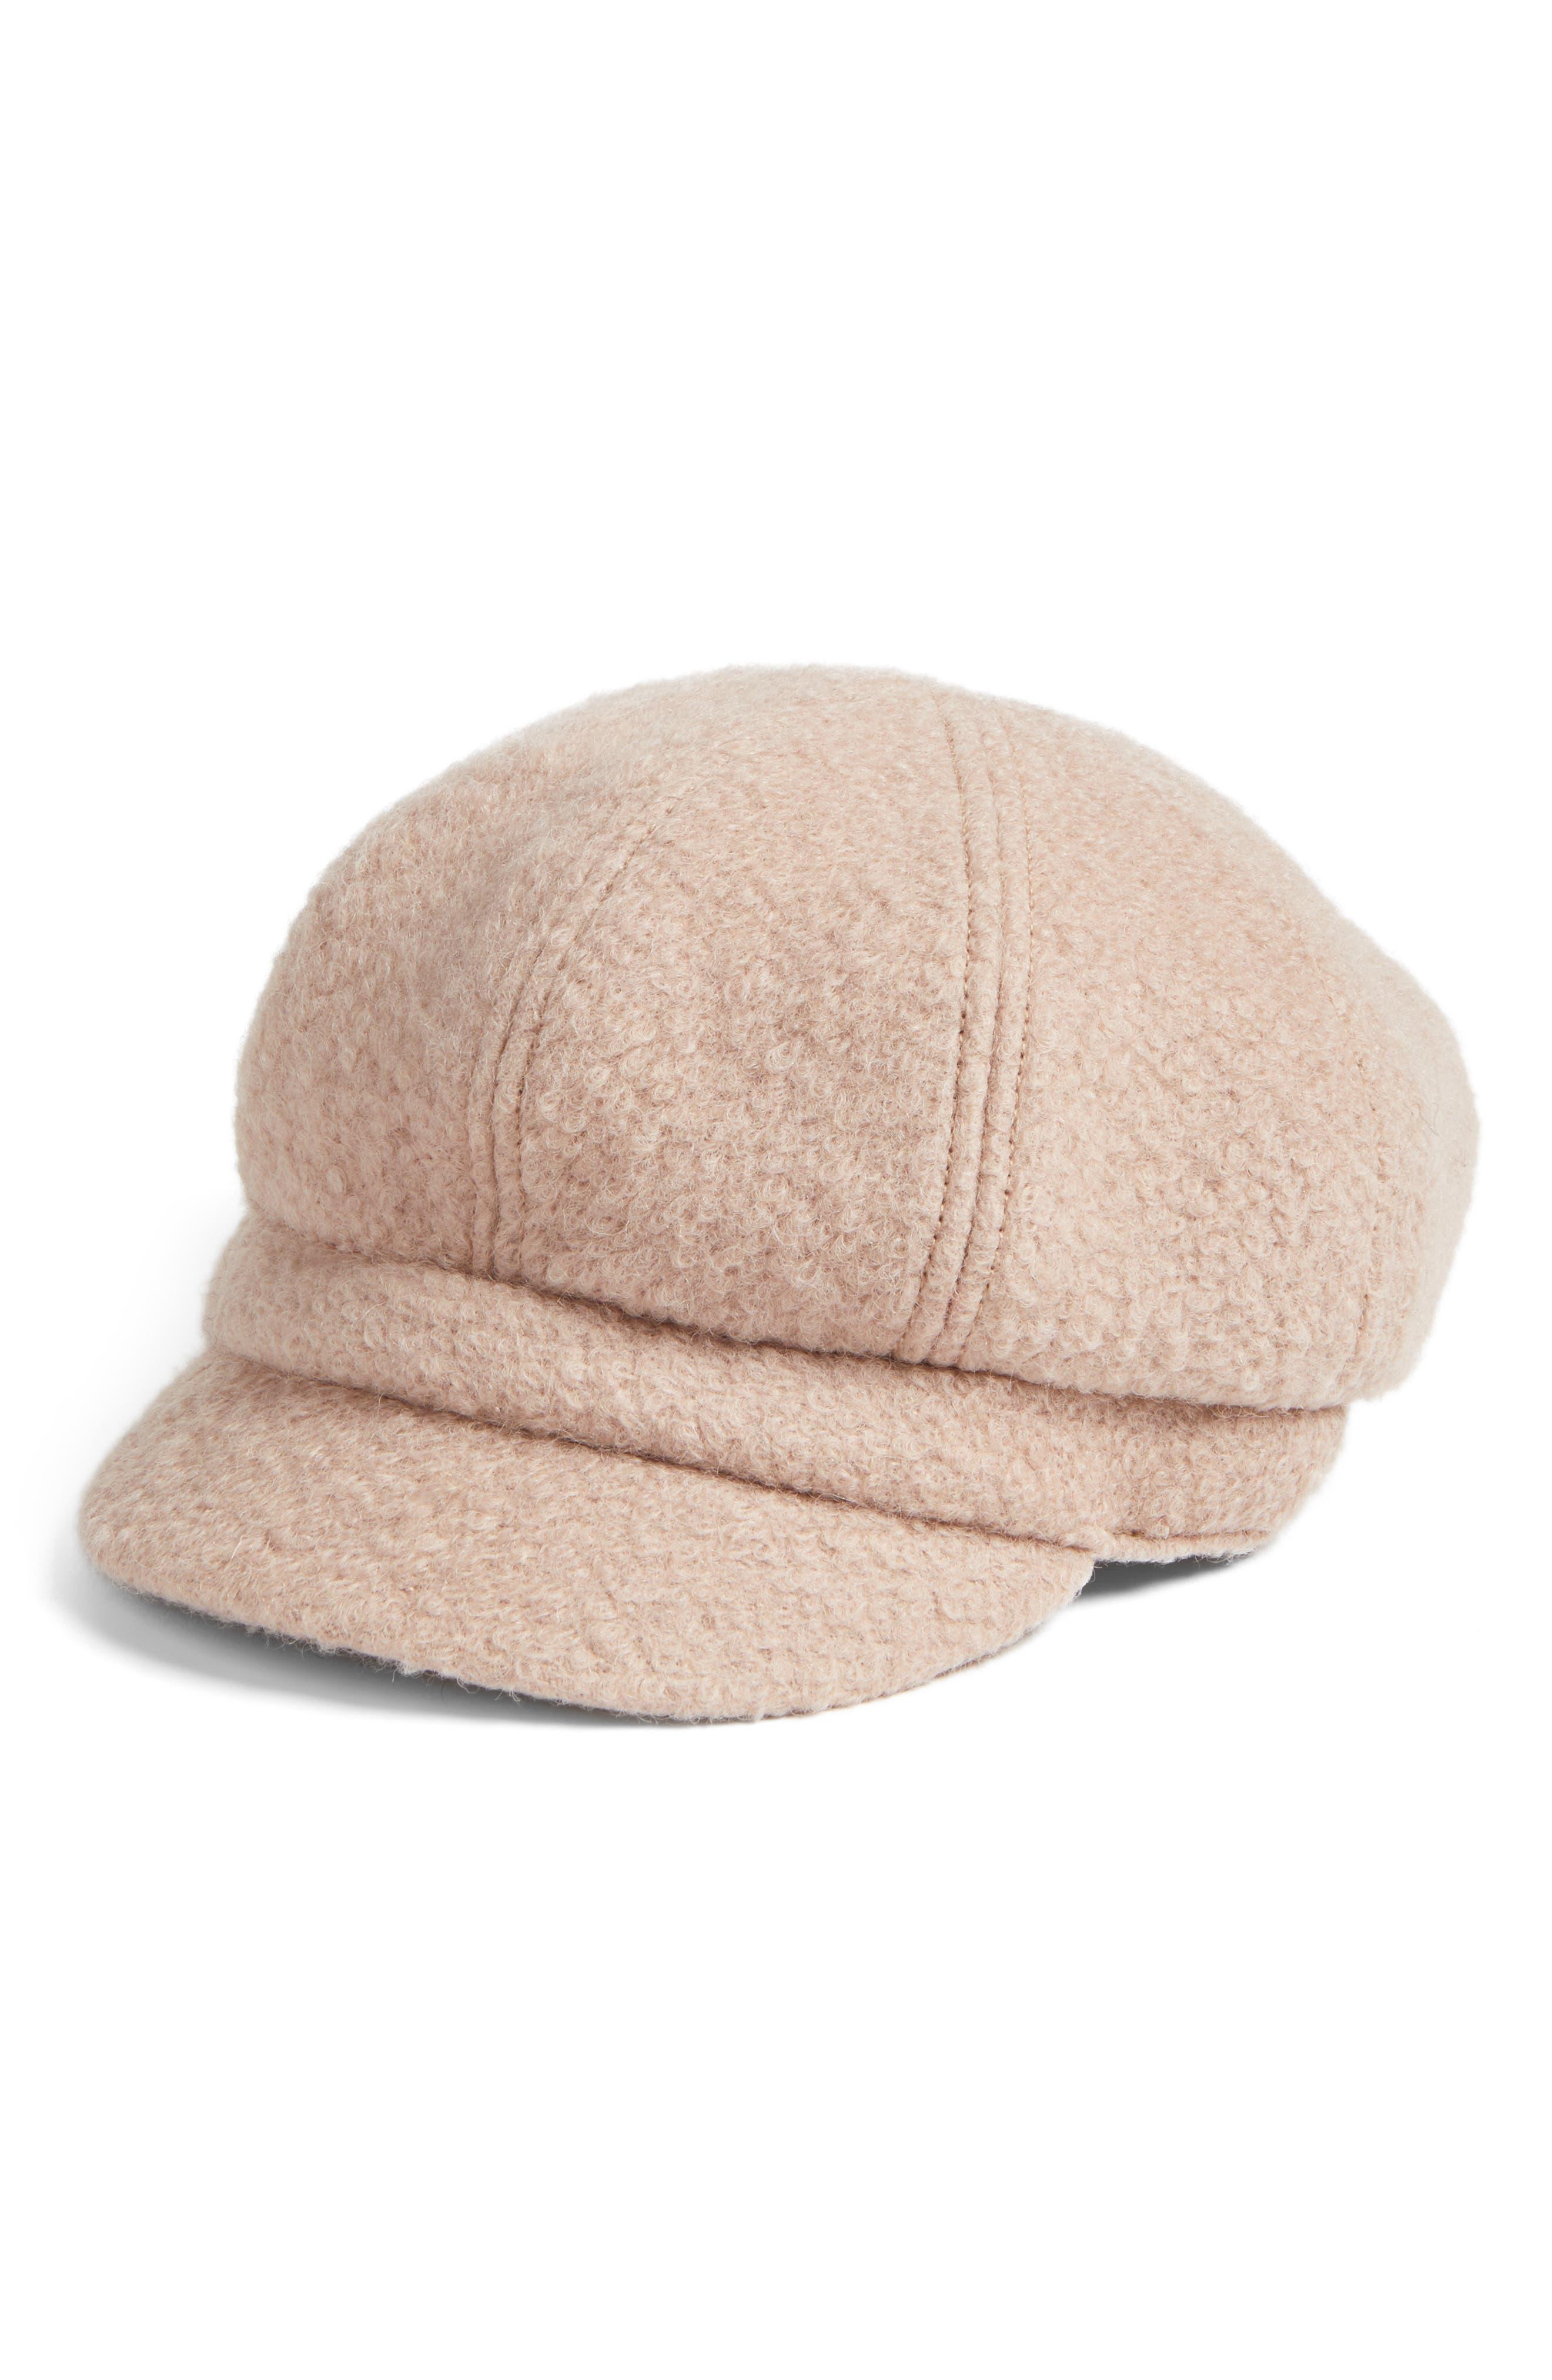 August Hat Boys are Back Bouclé Newsboy Cap